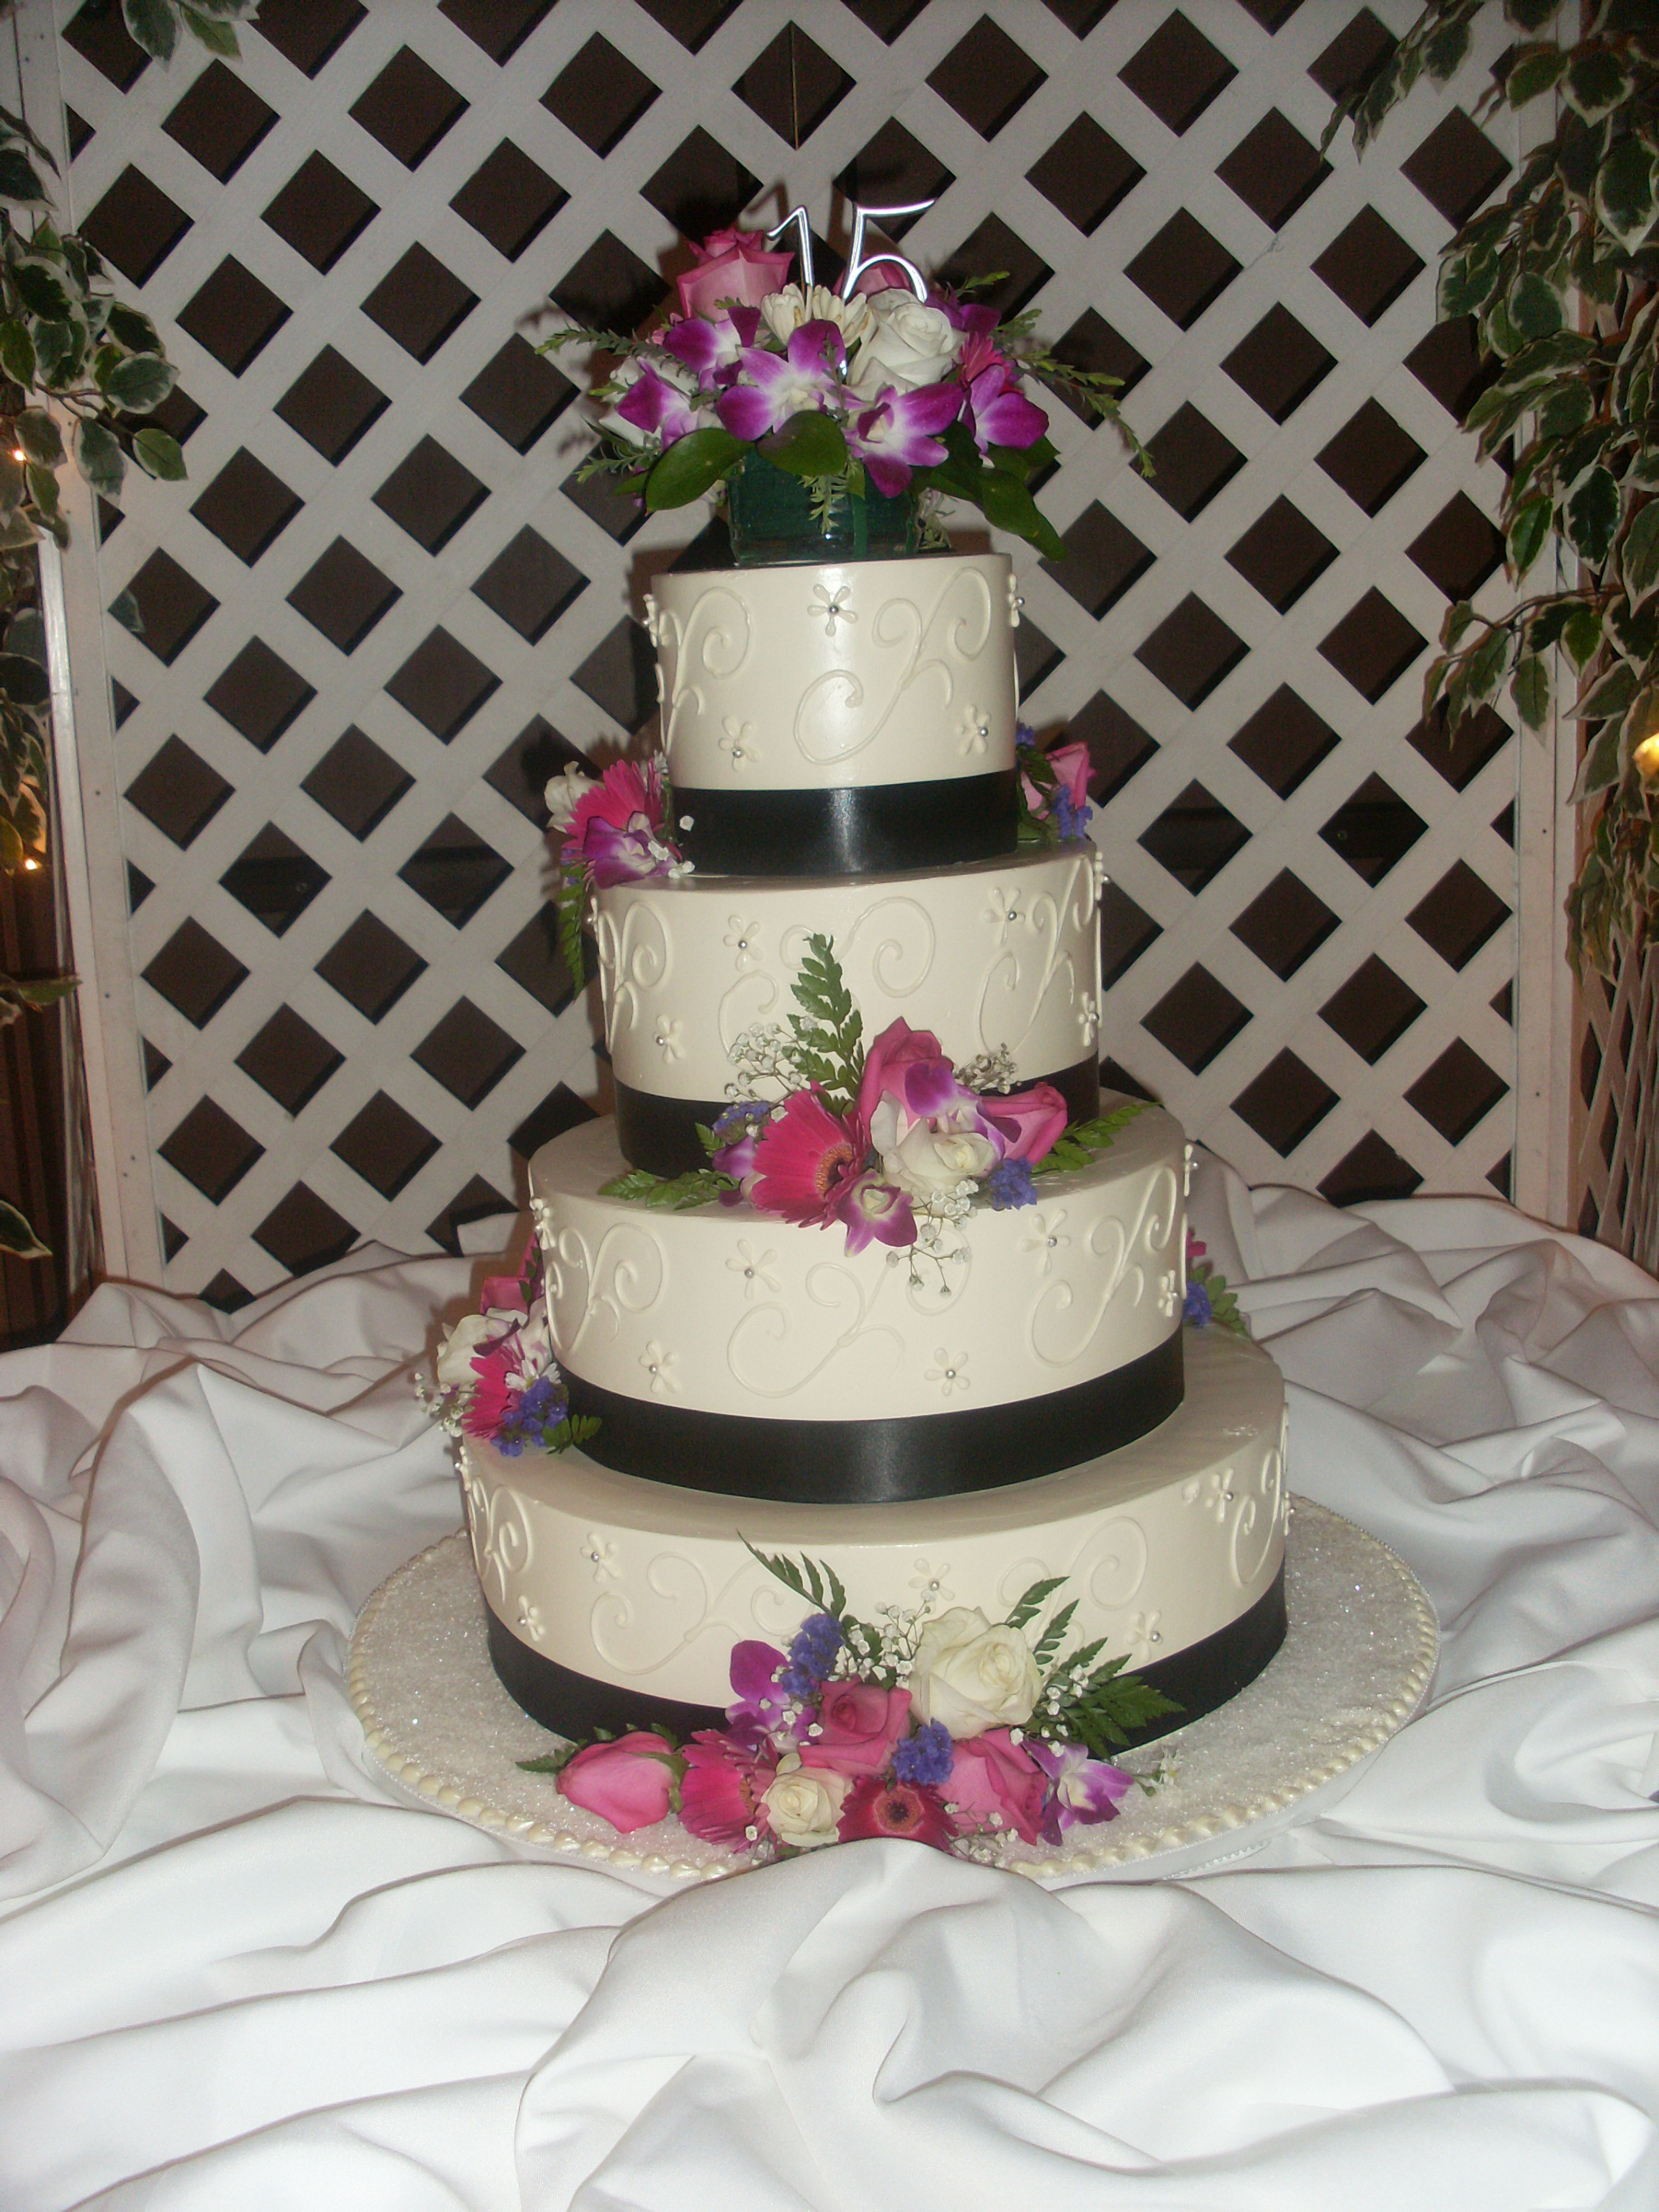 wedding cake different flavors cake flavor options for your next celebration wedding cake. Black Bedroom Furniture Sets. Home Design Ideas